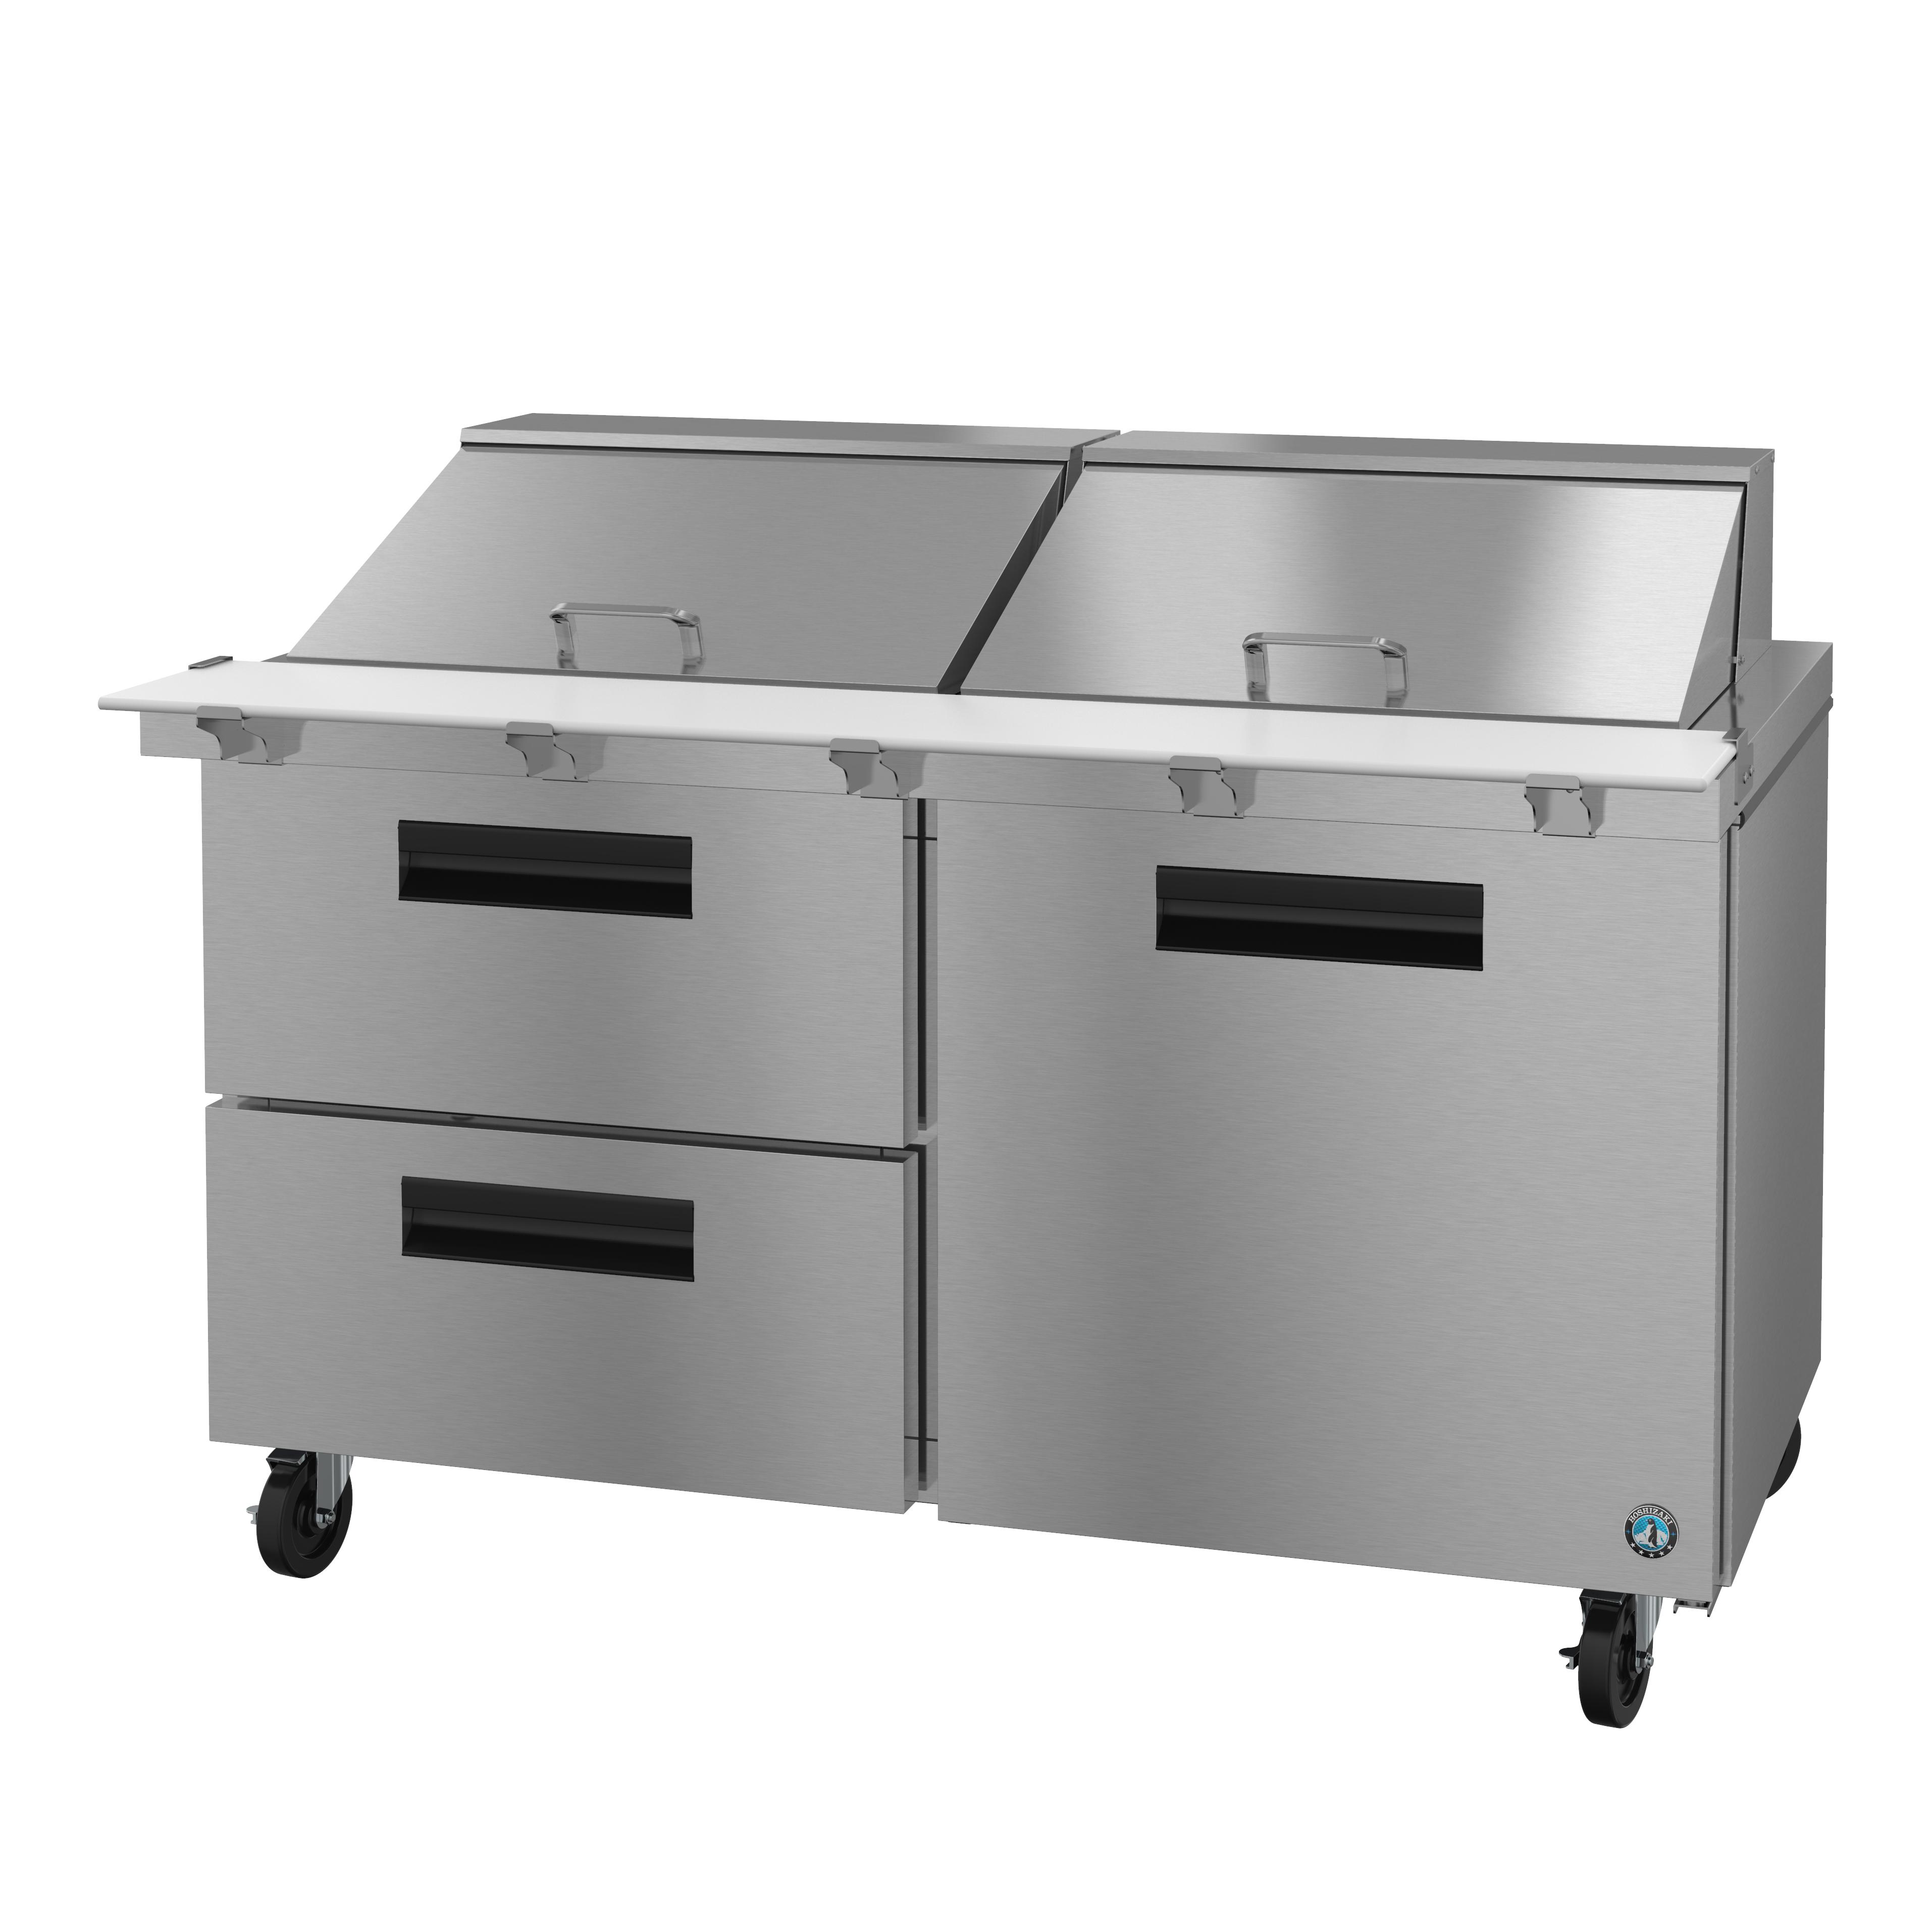 Hoshizaki SR60A-24MD2 refrigerated counter, mega top sandwich / salad unit